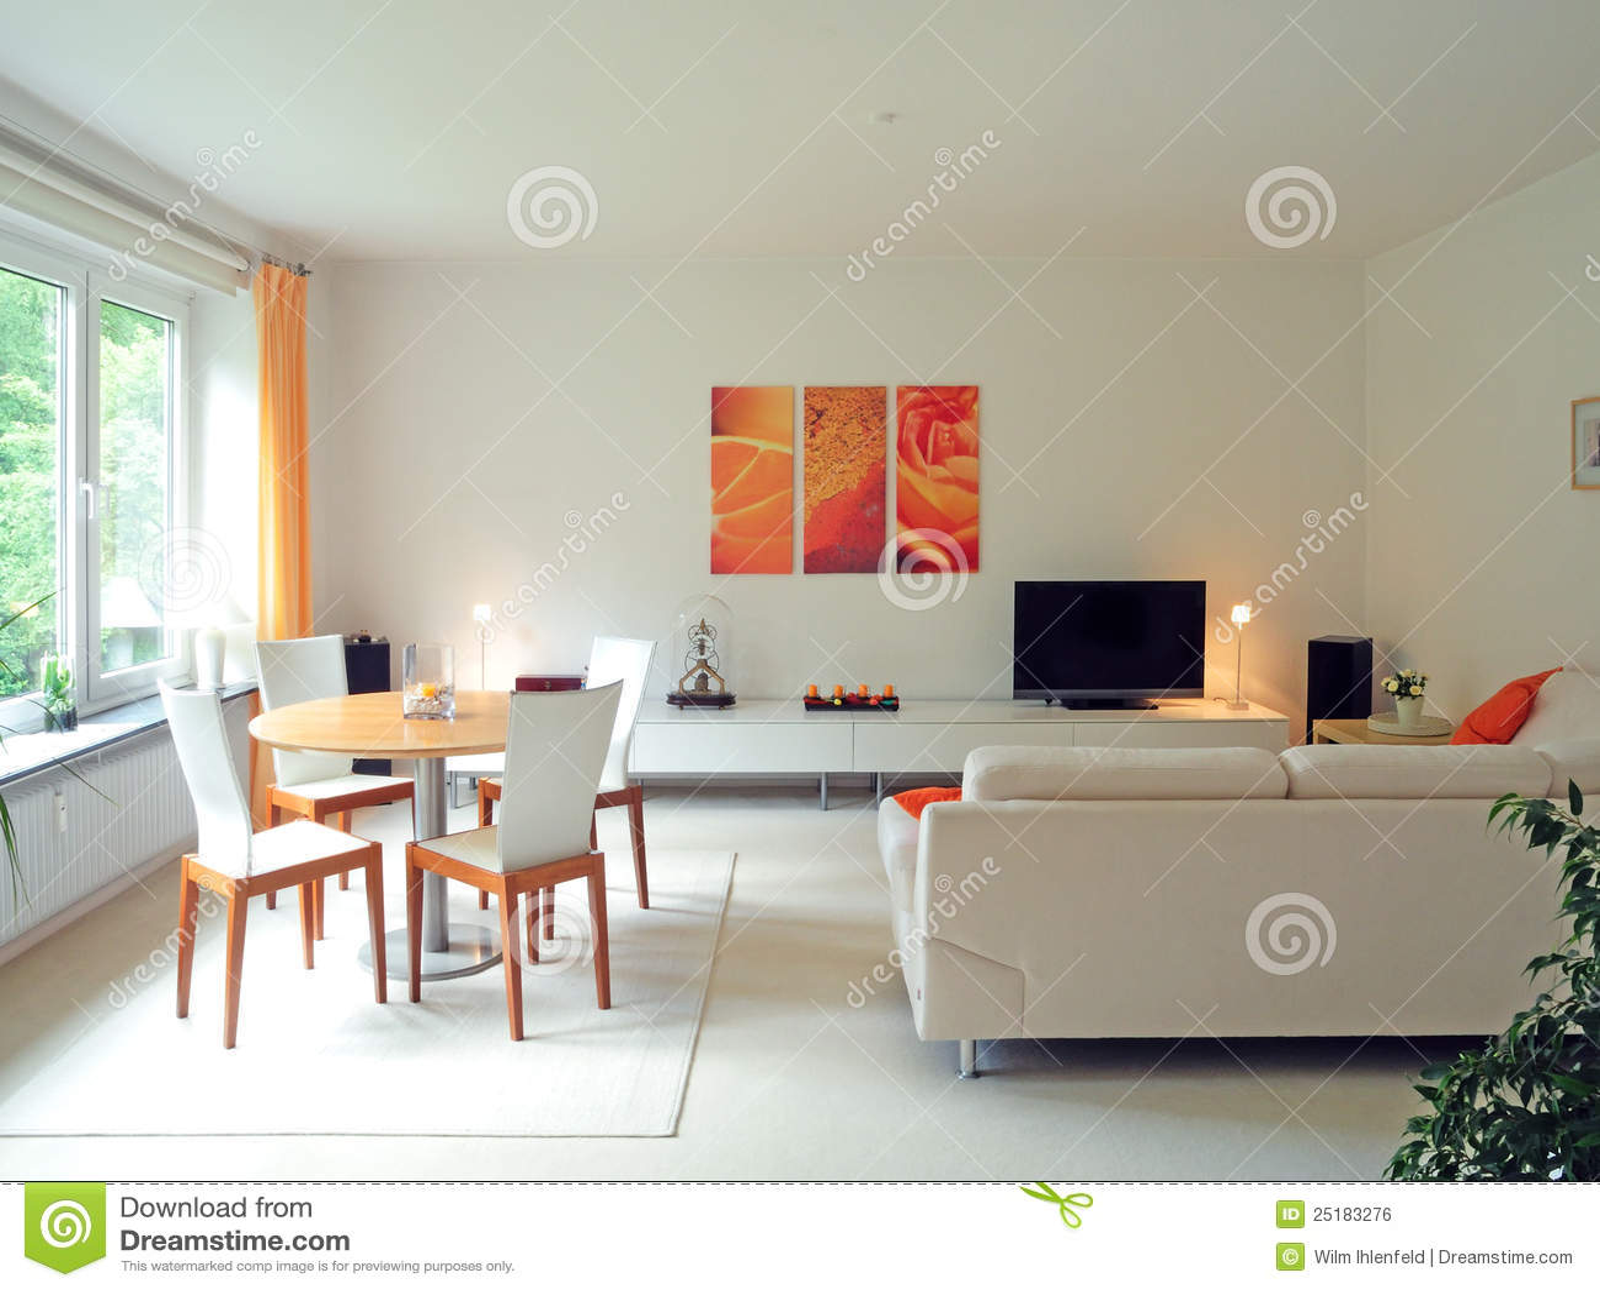 Moderne woonkamer royalty vrije stock afbeelding afbeelding 25183276 for Moderne woonkamer